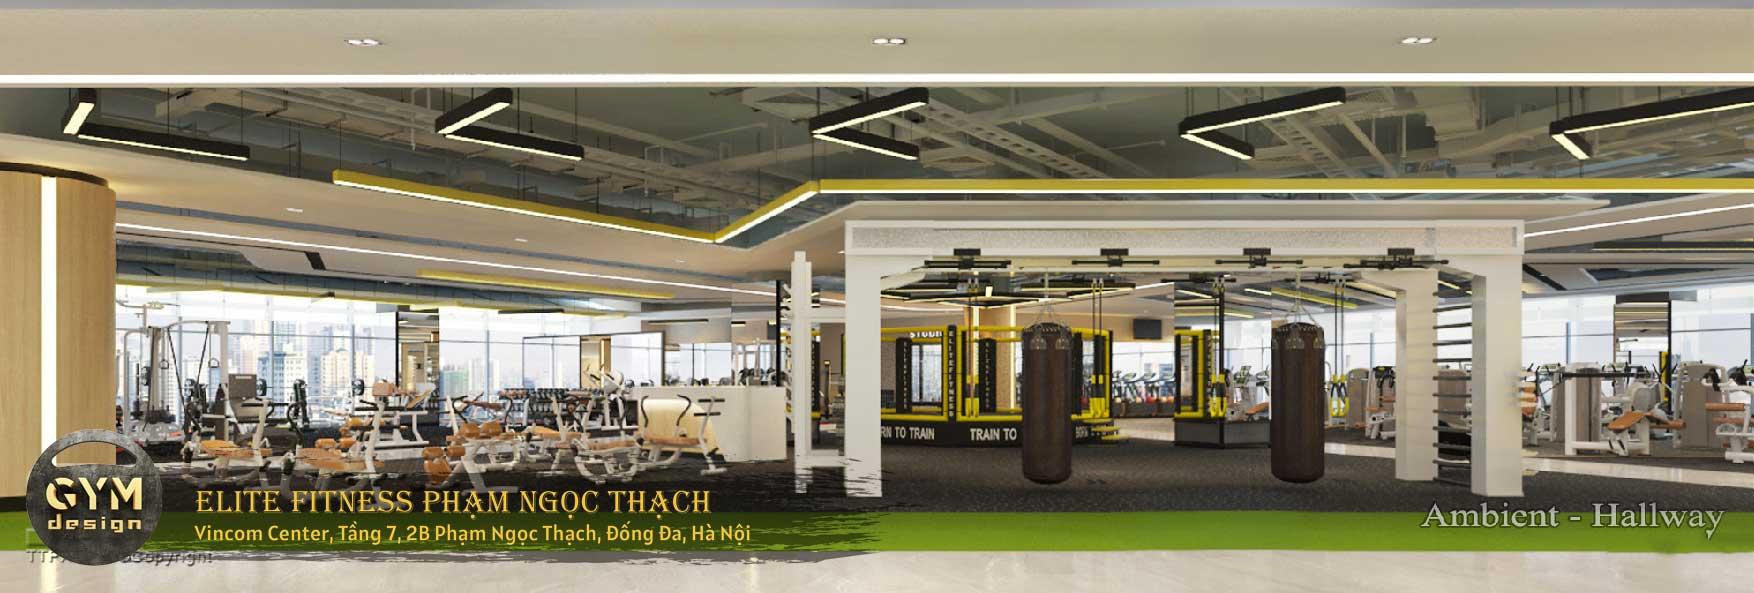 du-an-elite-fitness-pham-ngoc-thach-50